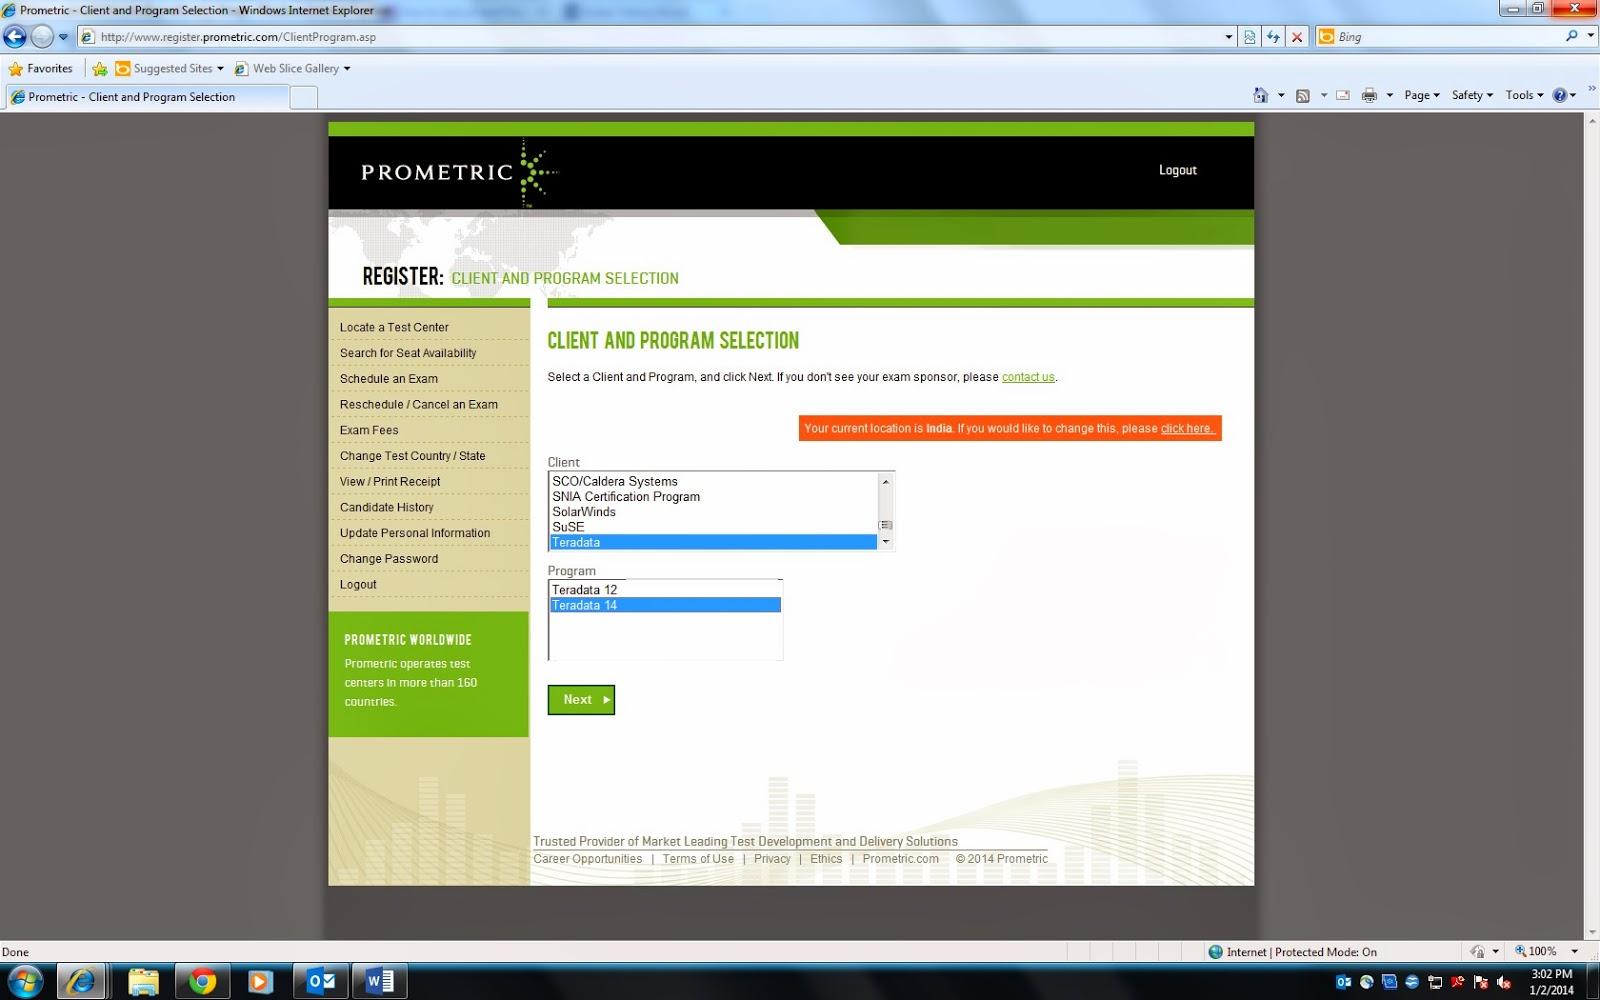 Certificationsinformation